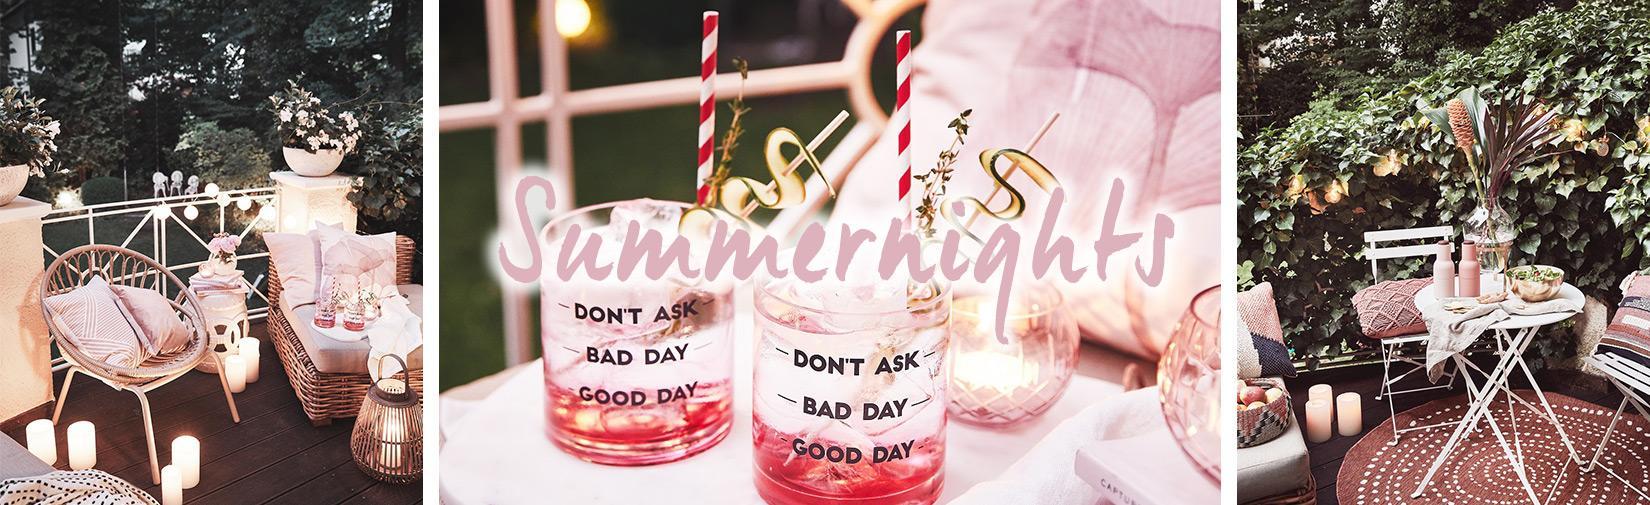 Trend_Summernights_LP-desktop